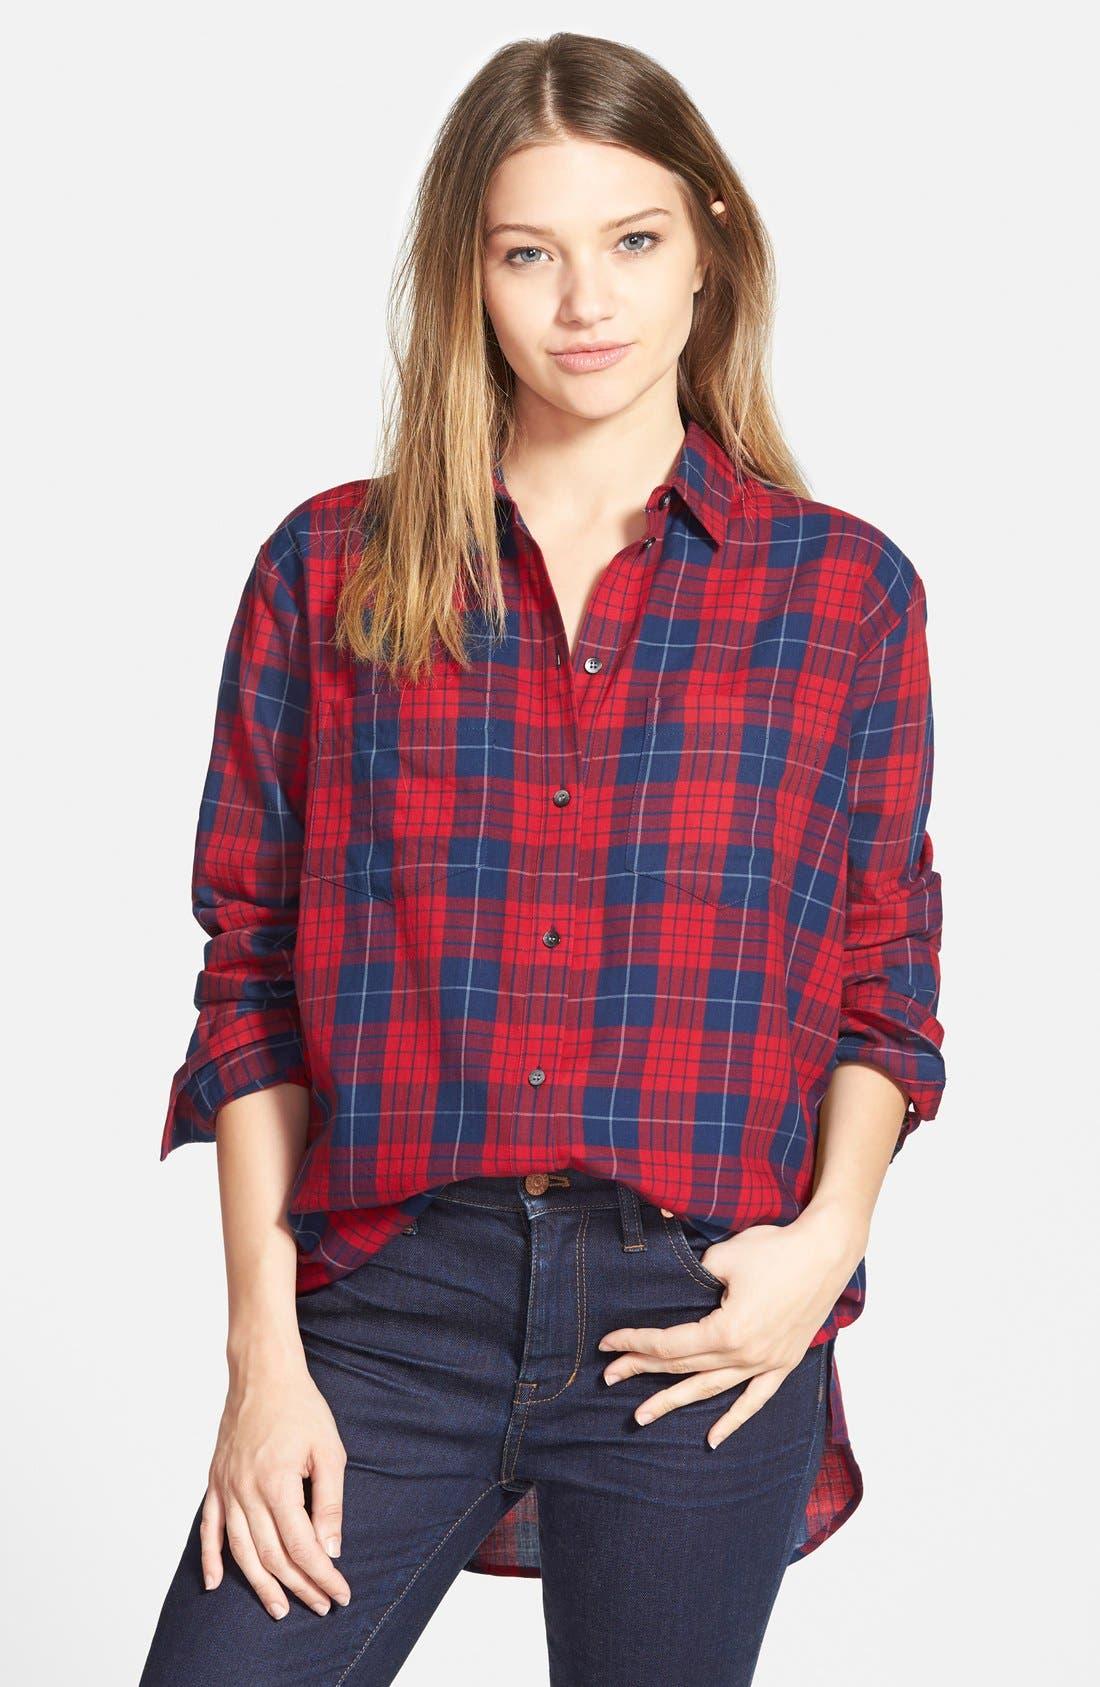 Madewell 'Edina Plaid' Oversize Boyshirt